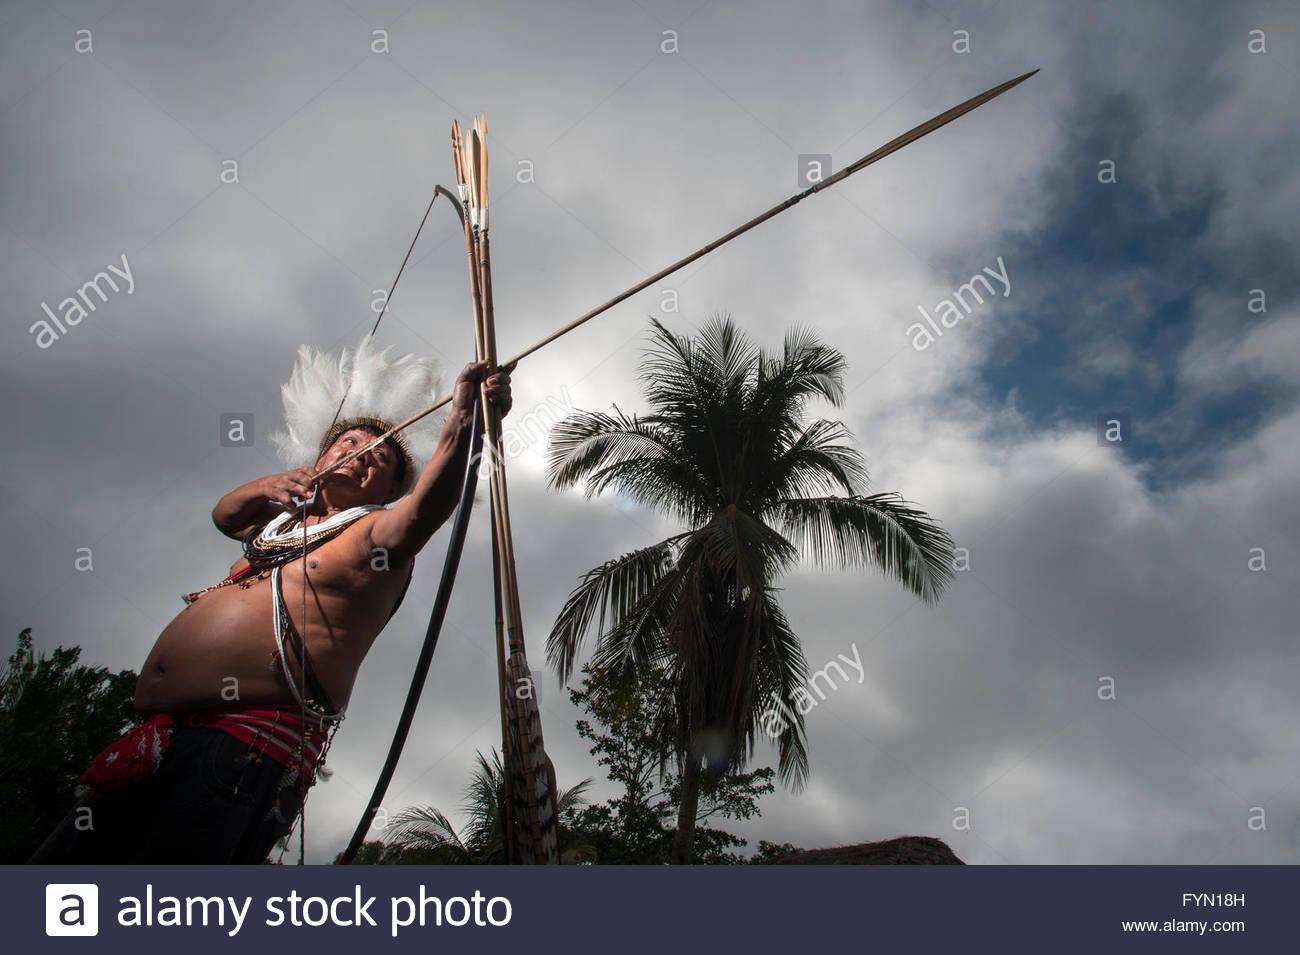 Moplip Surui in Lapetanha, Rondonia, Brazil at the '7th September Indian Reserve'. - Stock Image